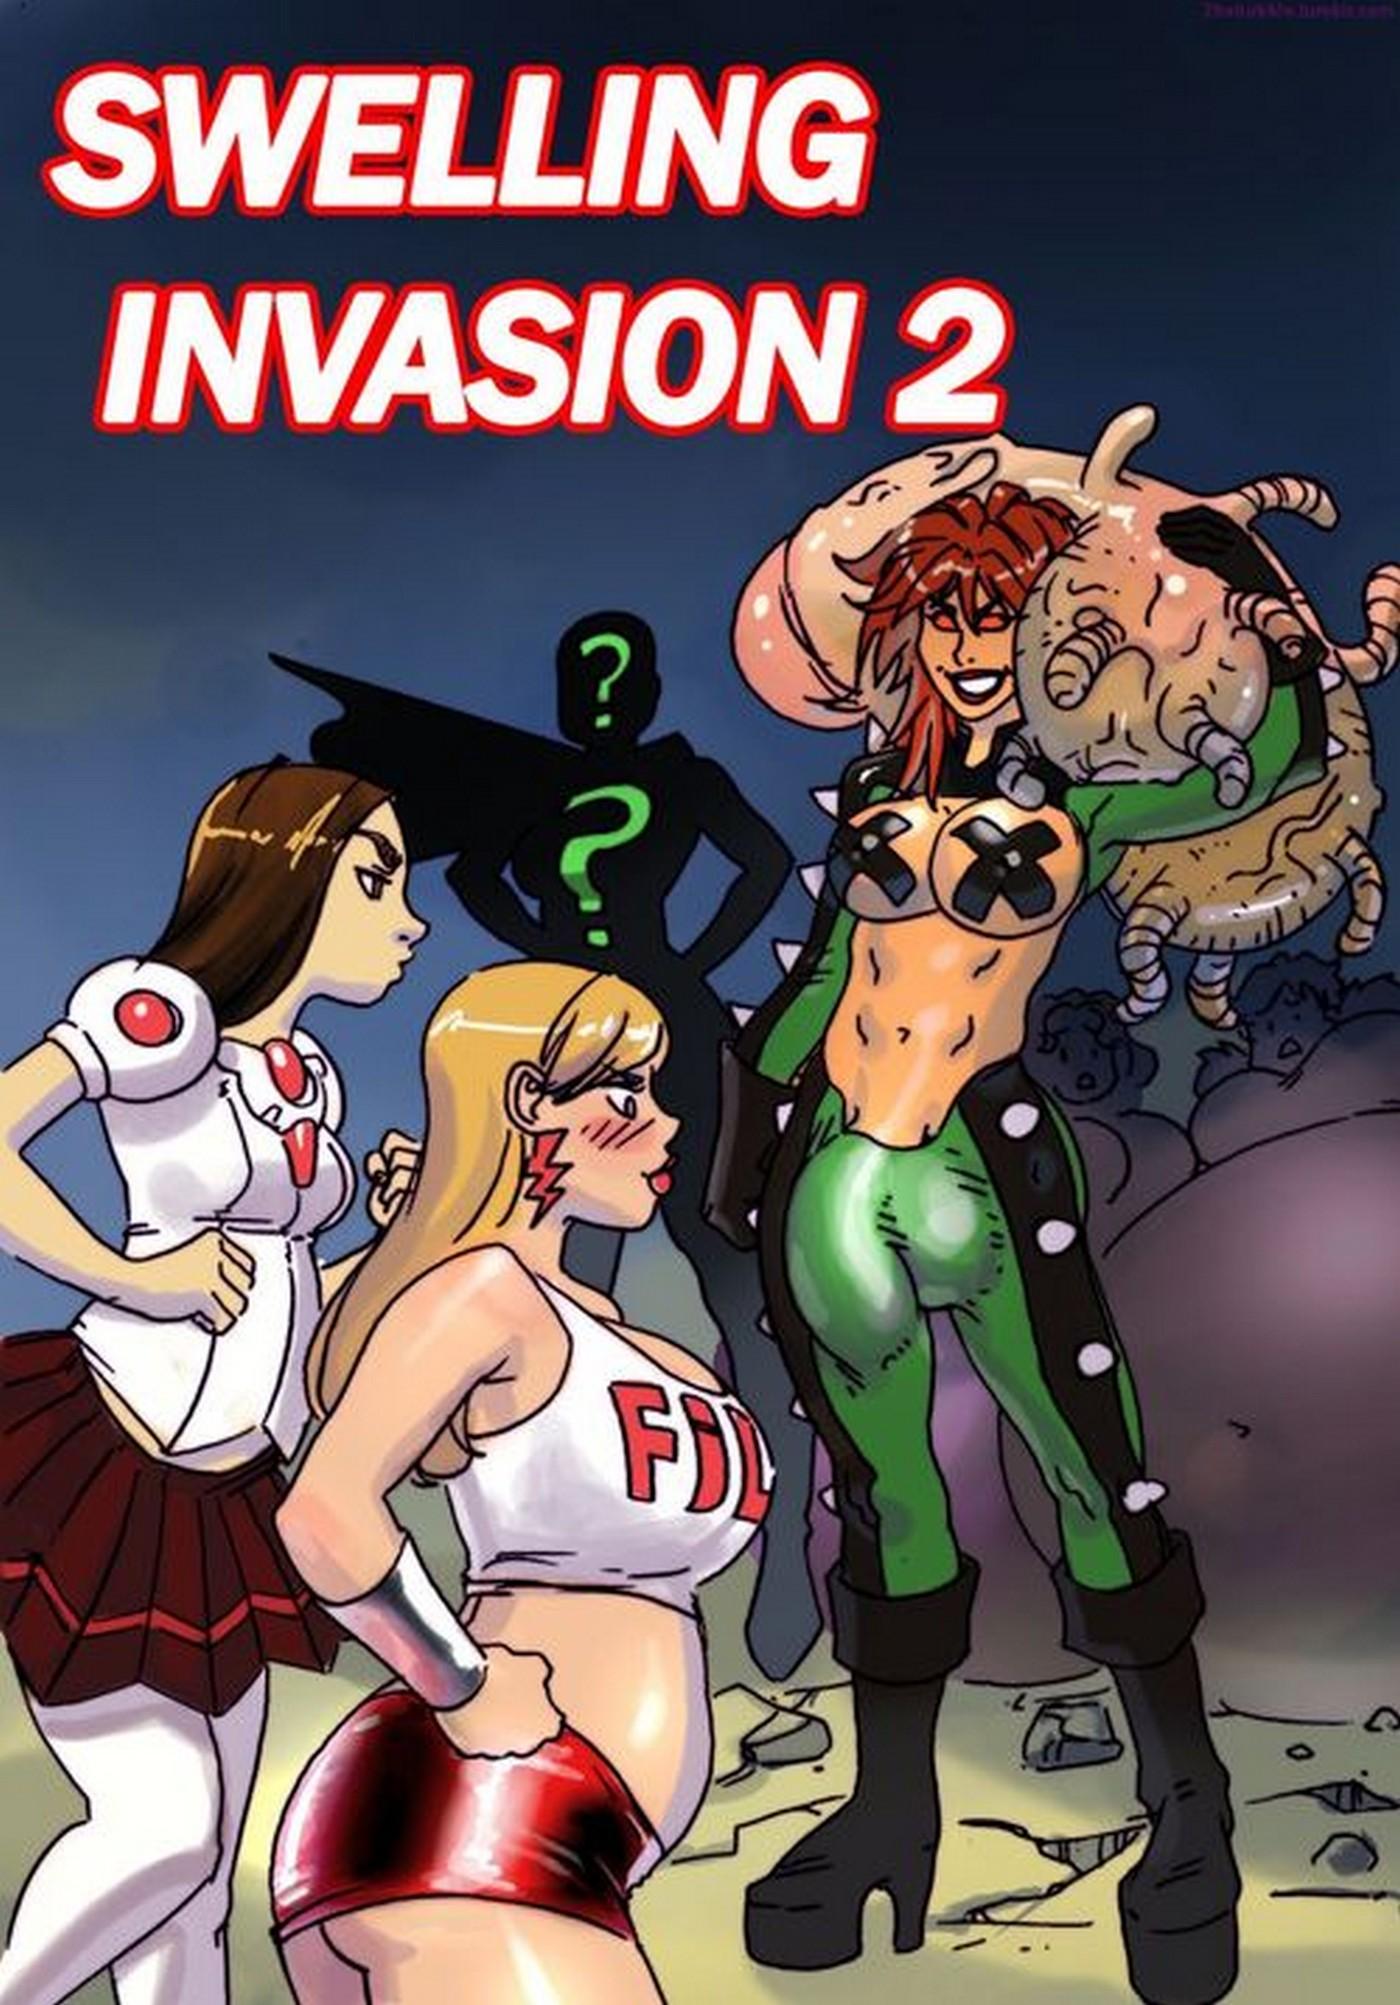 Swelling Invasion 2 Sidneymt 01